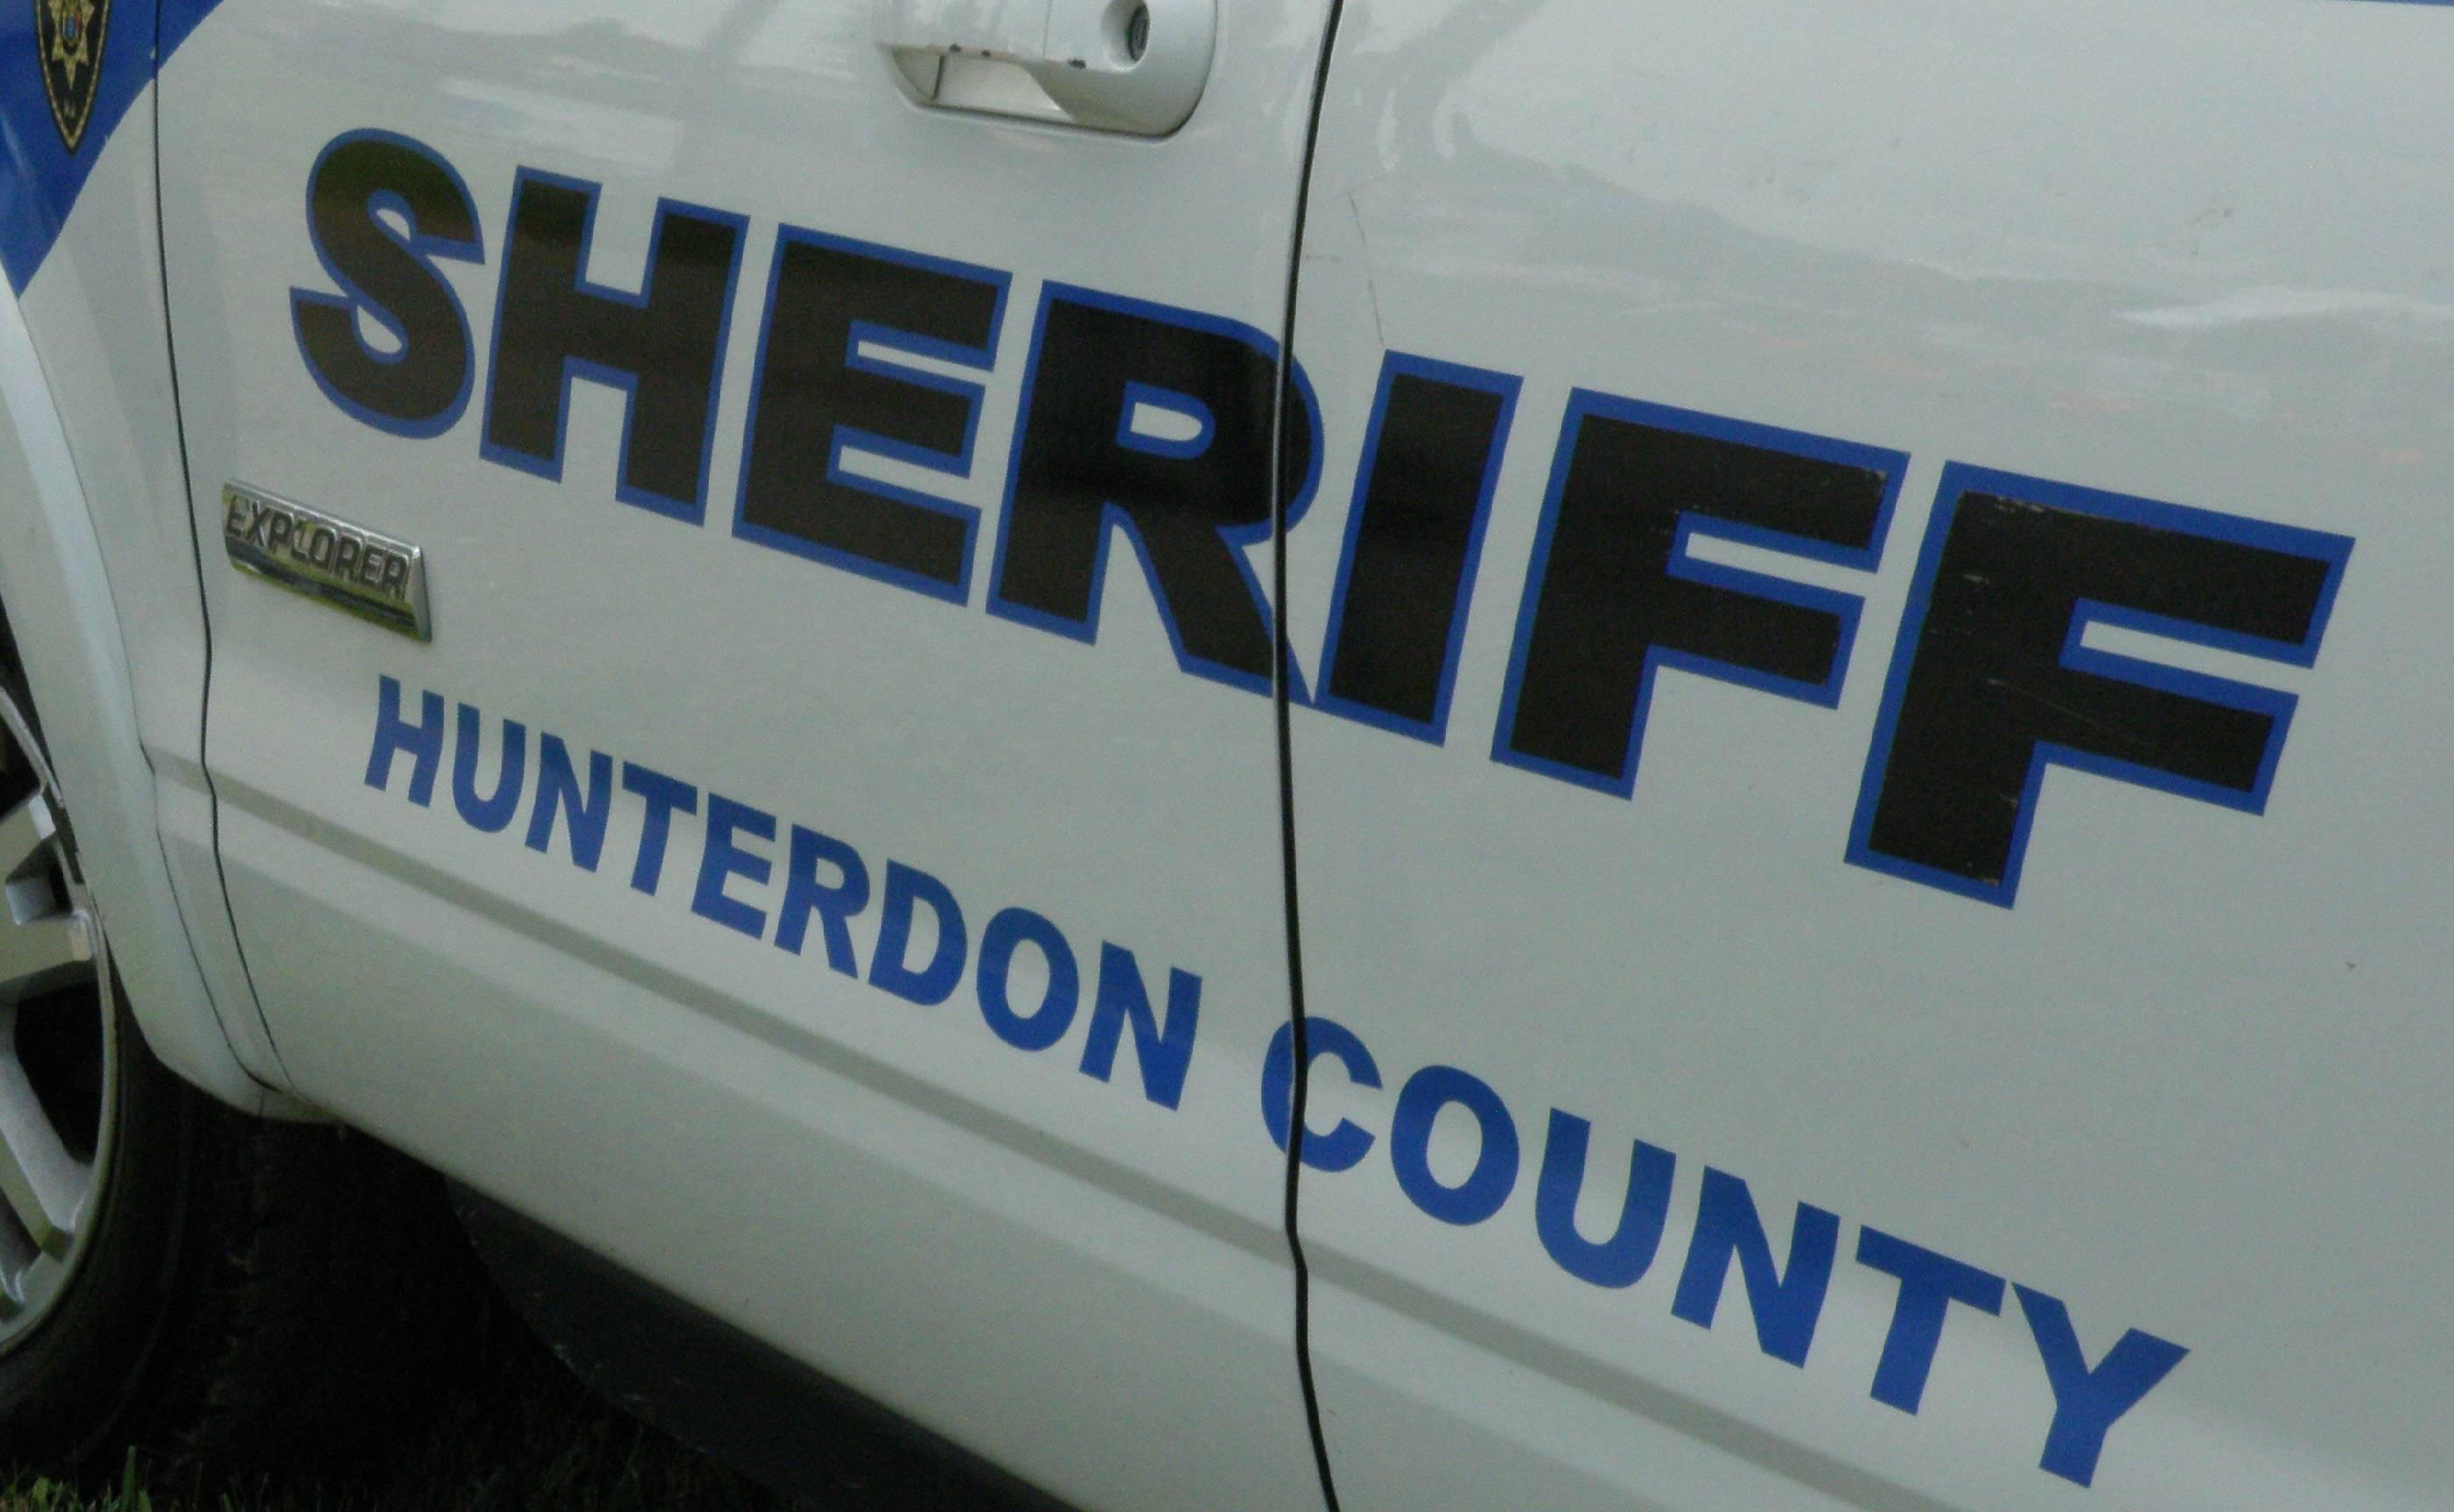 c43c05ffd773532d7e54_hunterdon_sheriff2.JPG